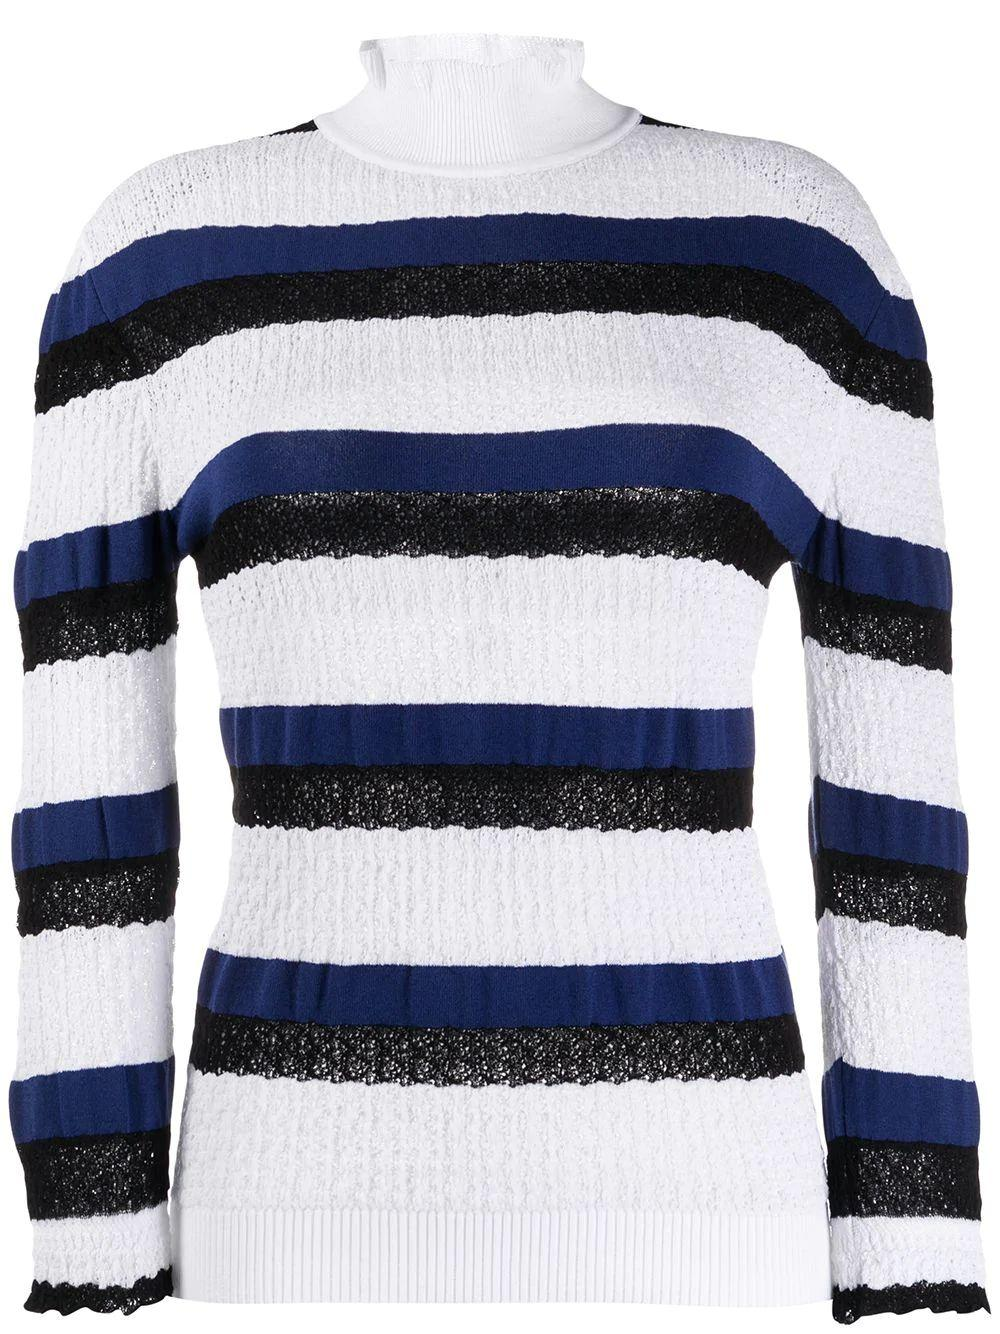 Long Sleeve Stripe Cloque Knit Top Item # CHC20SMP57620